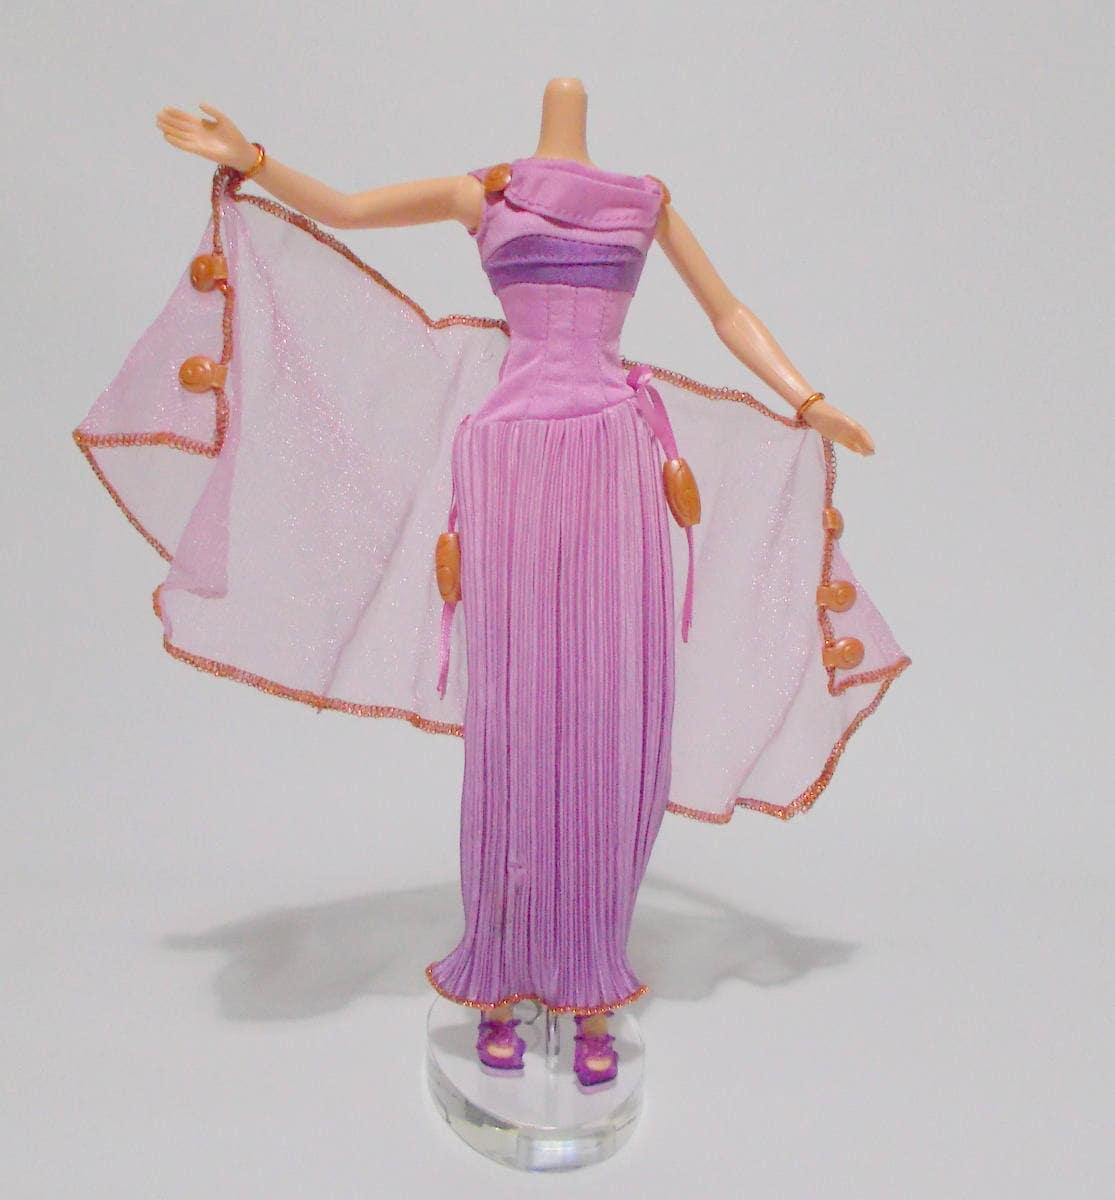 Disney Megara muñeca vestido moda Hércules púrpura falda   Etsy